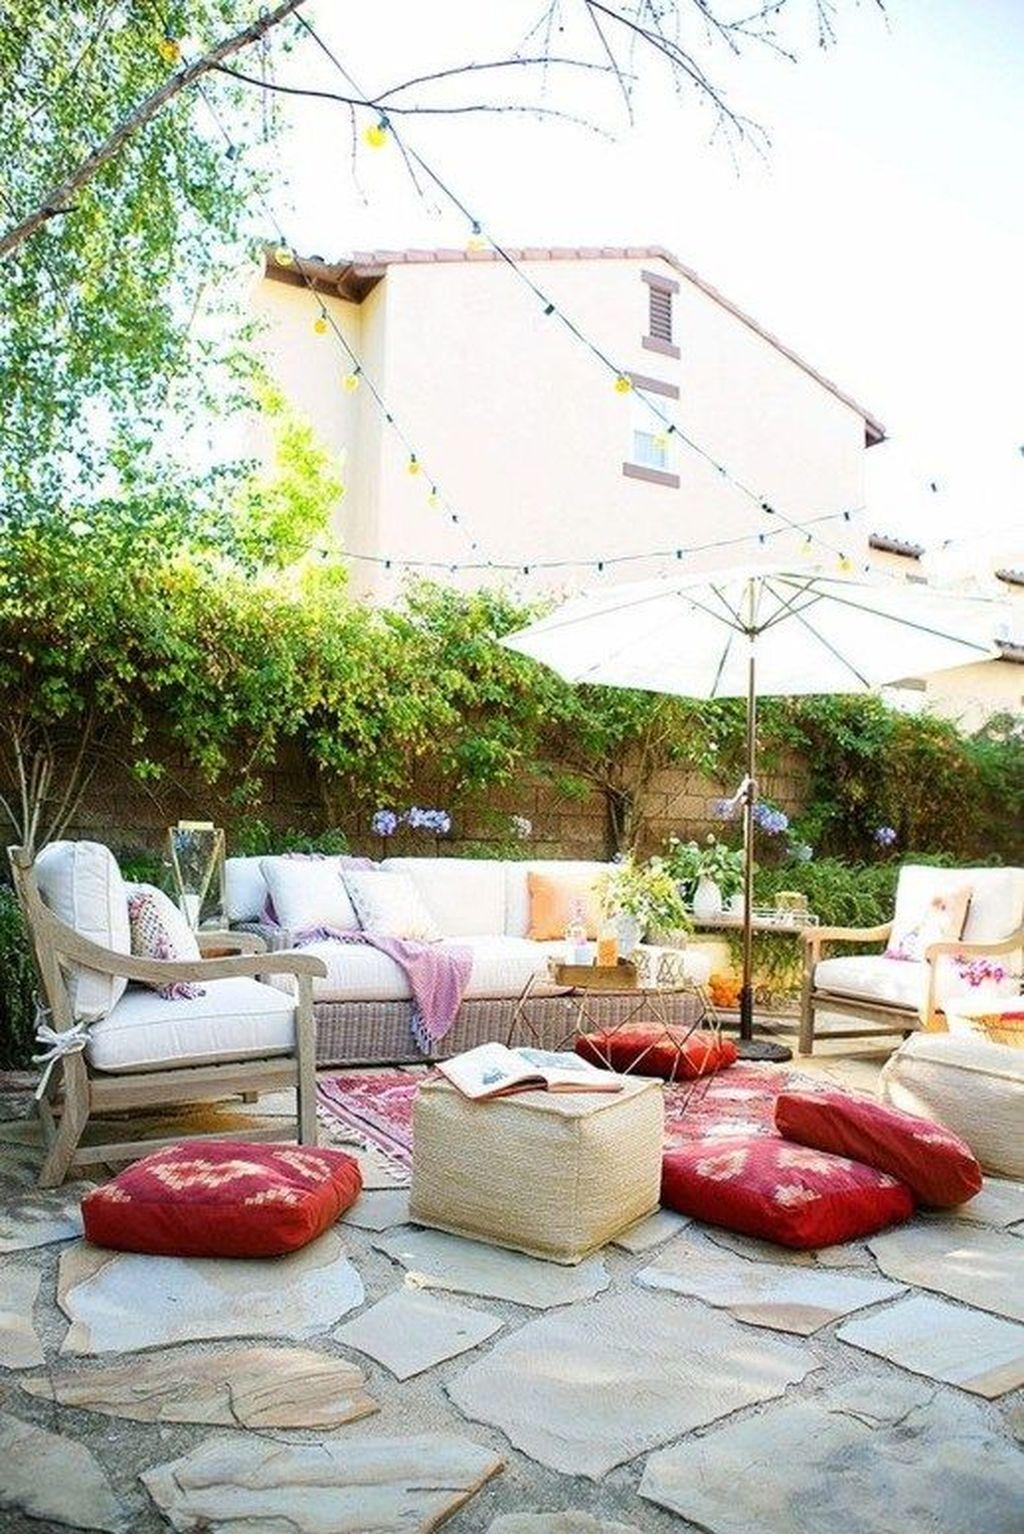 Inspiring Boho Outdoor Decorating Ideas For Backyard29